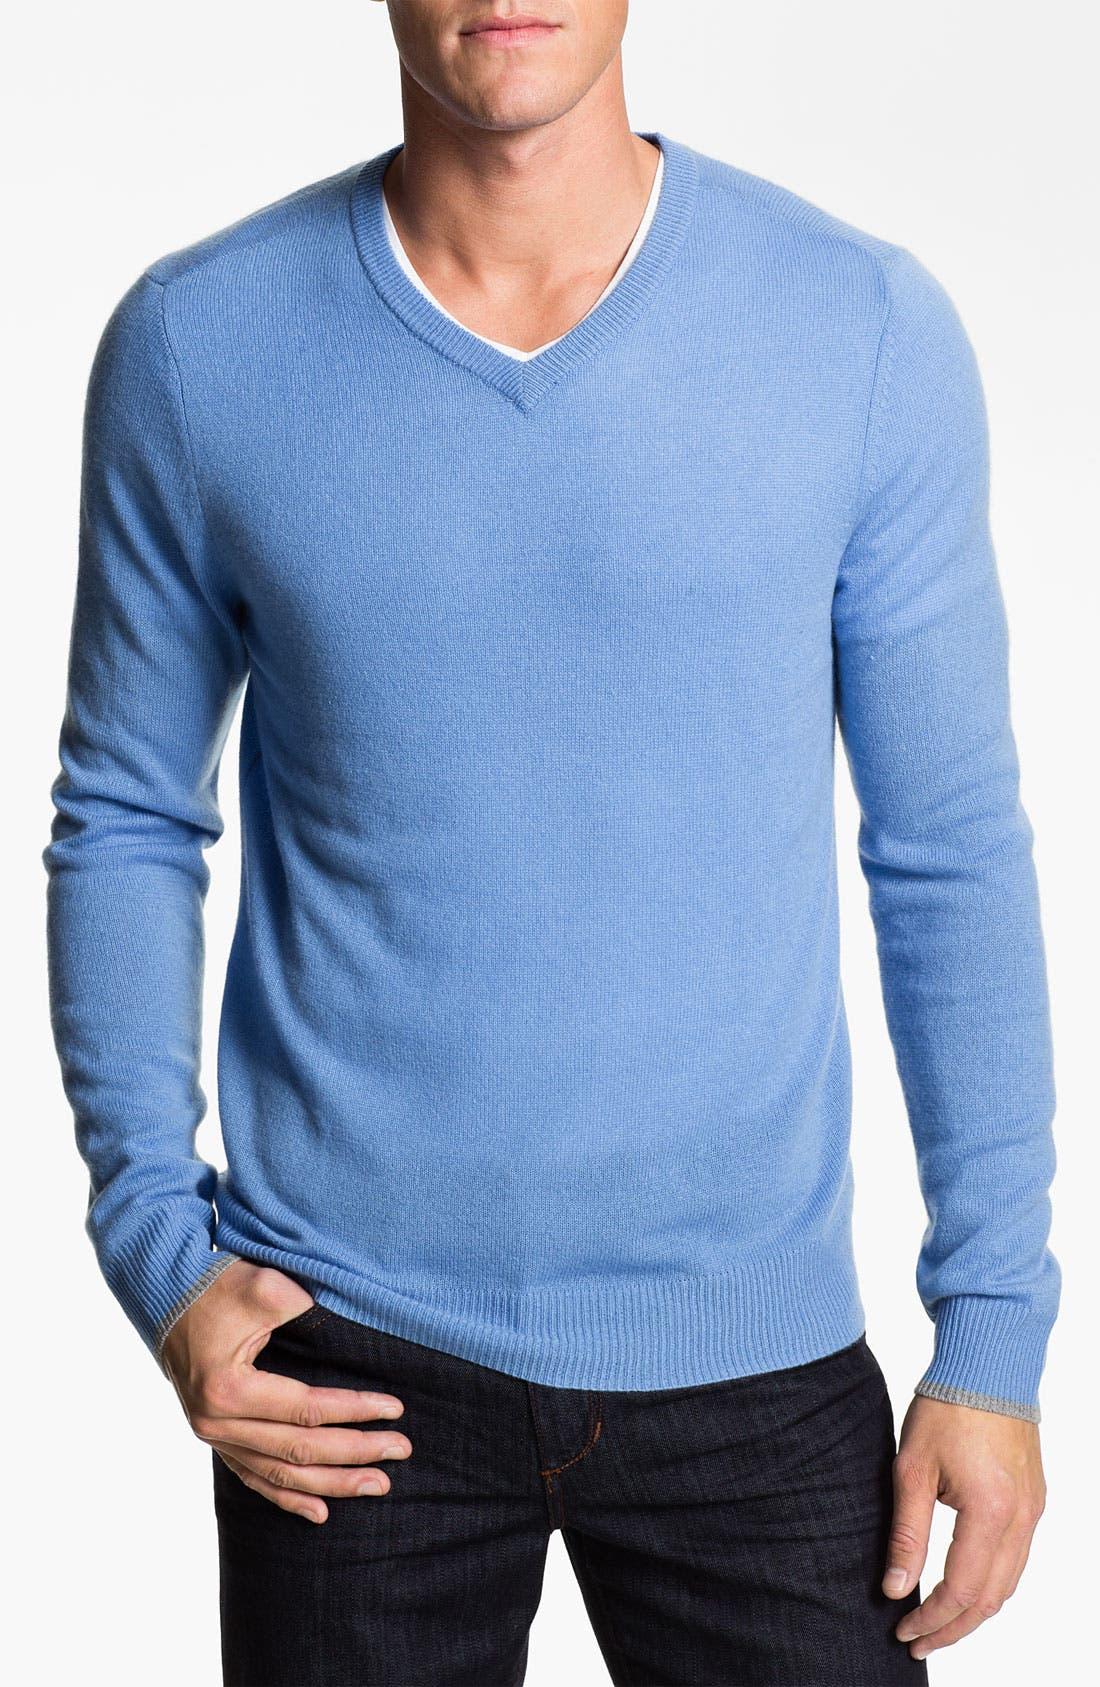 Main Image - 1901 Trim Fit V-Neck Cashmere Sweater